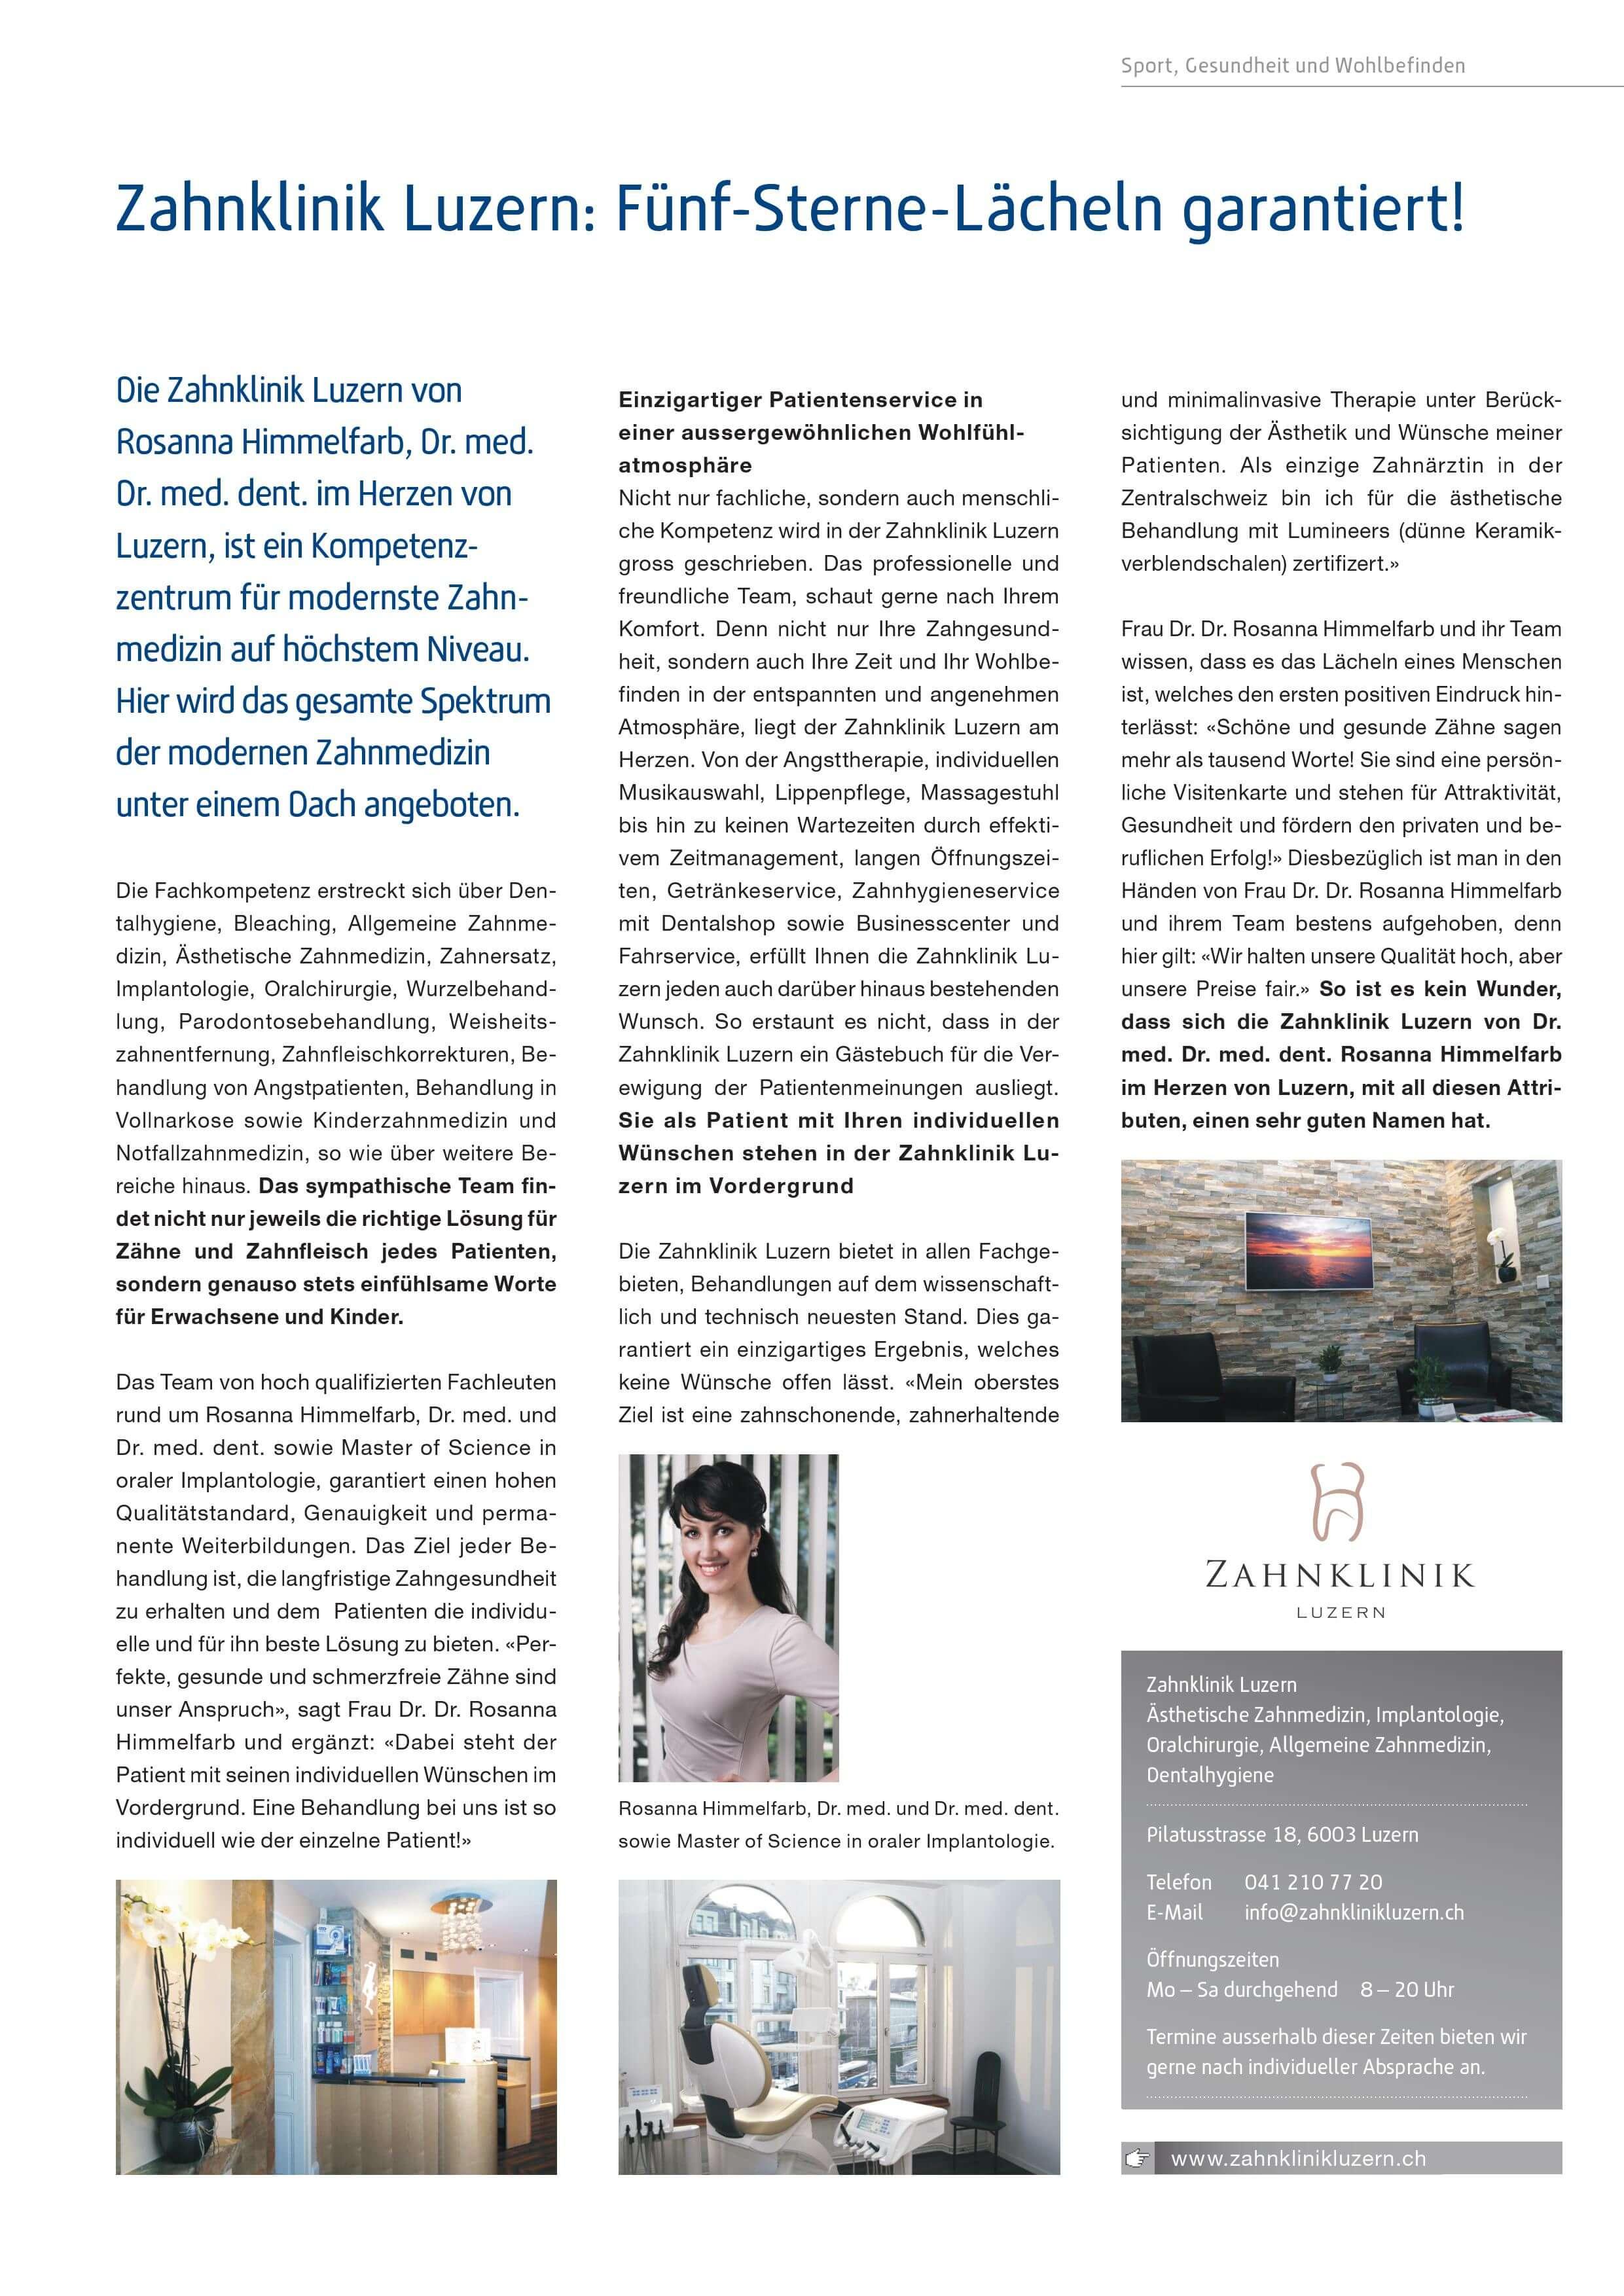 ▷Zahnarzt News - zahnarzt-luzern-zahnklinik.ch